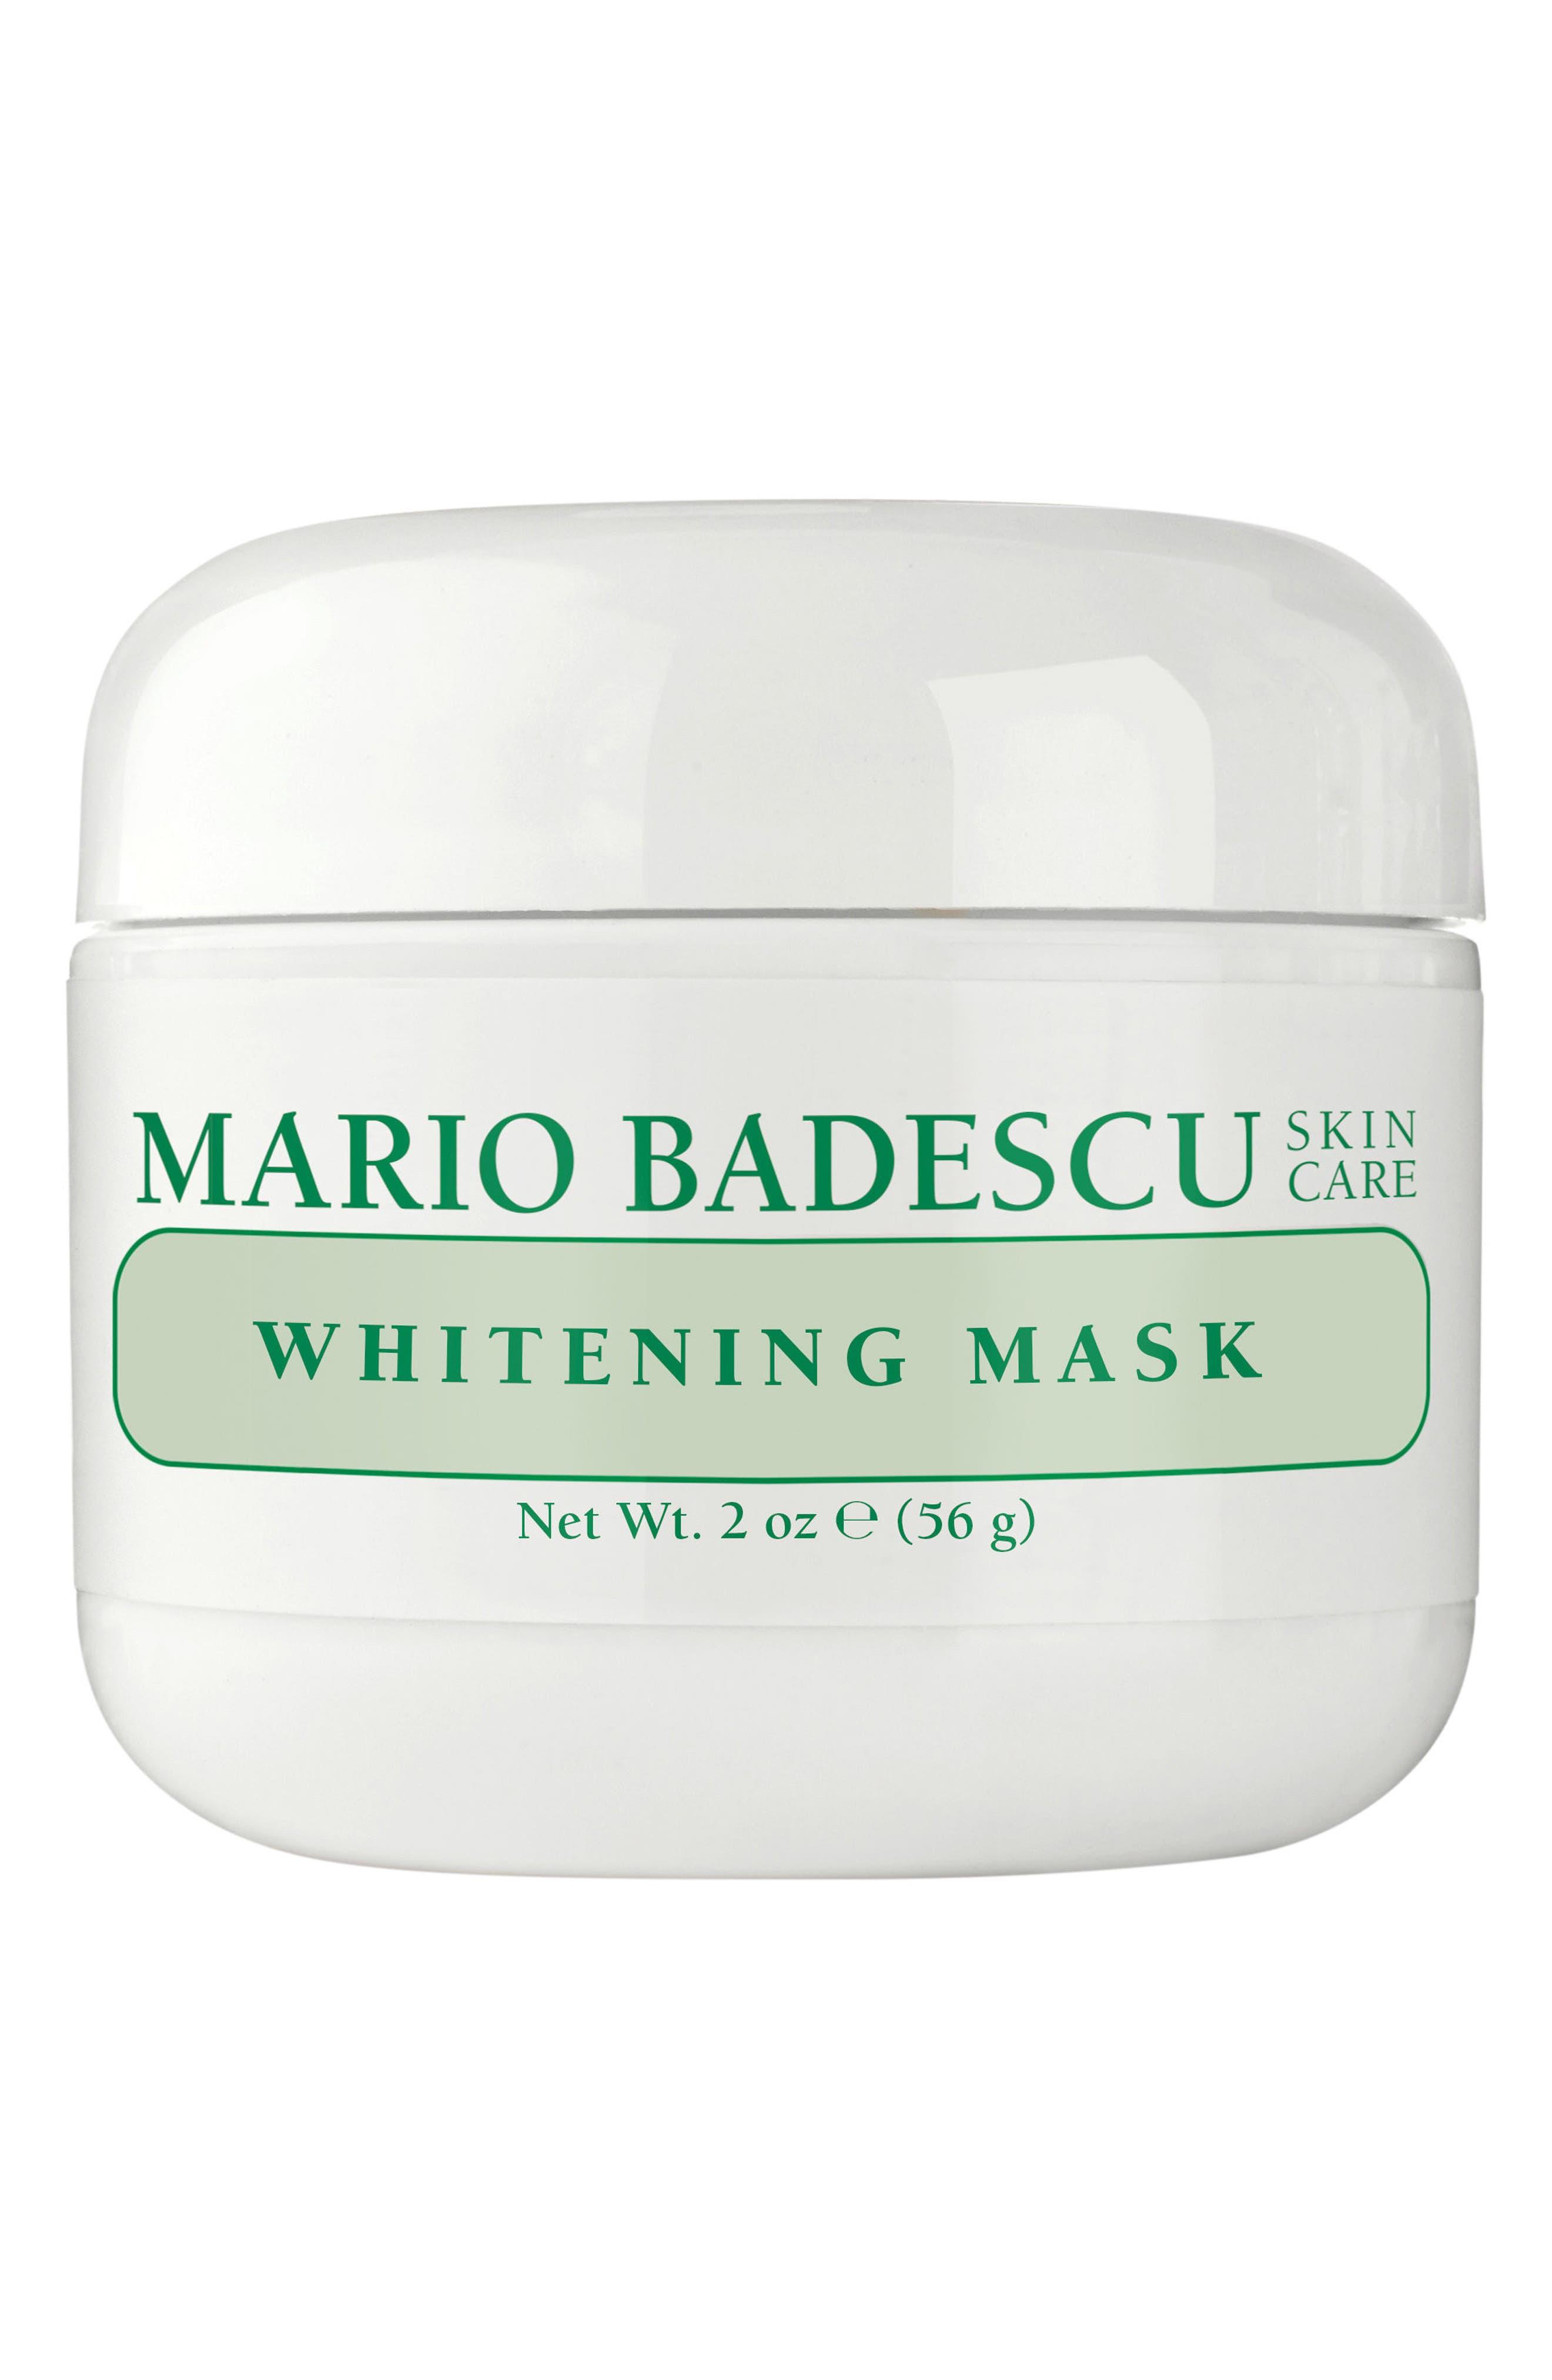 MARIO BADESCU Whitening Mask, Main, color, NO COLOR